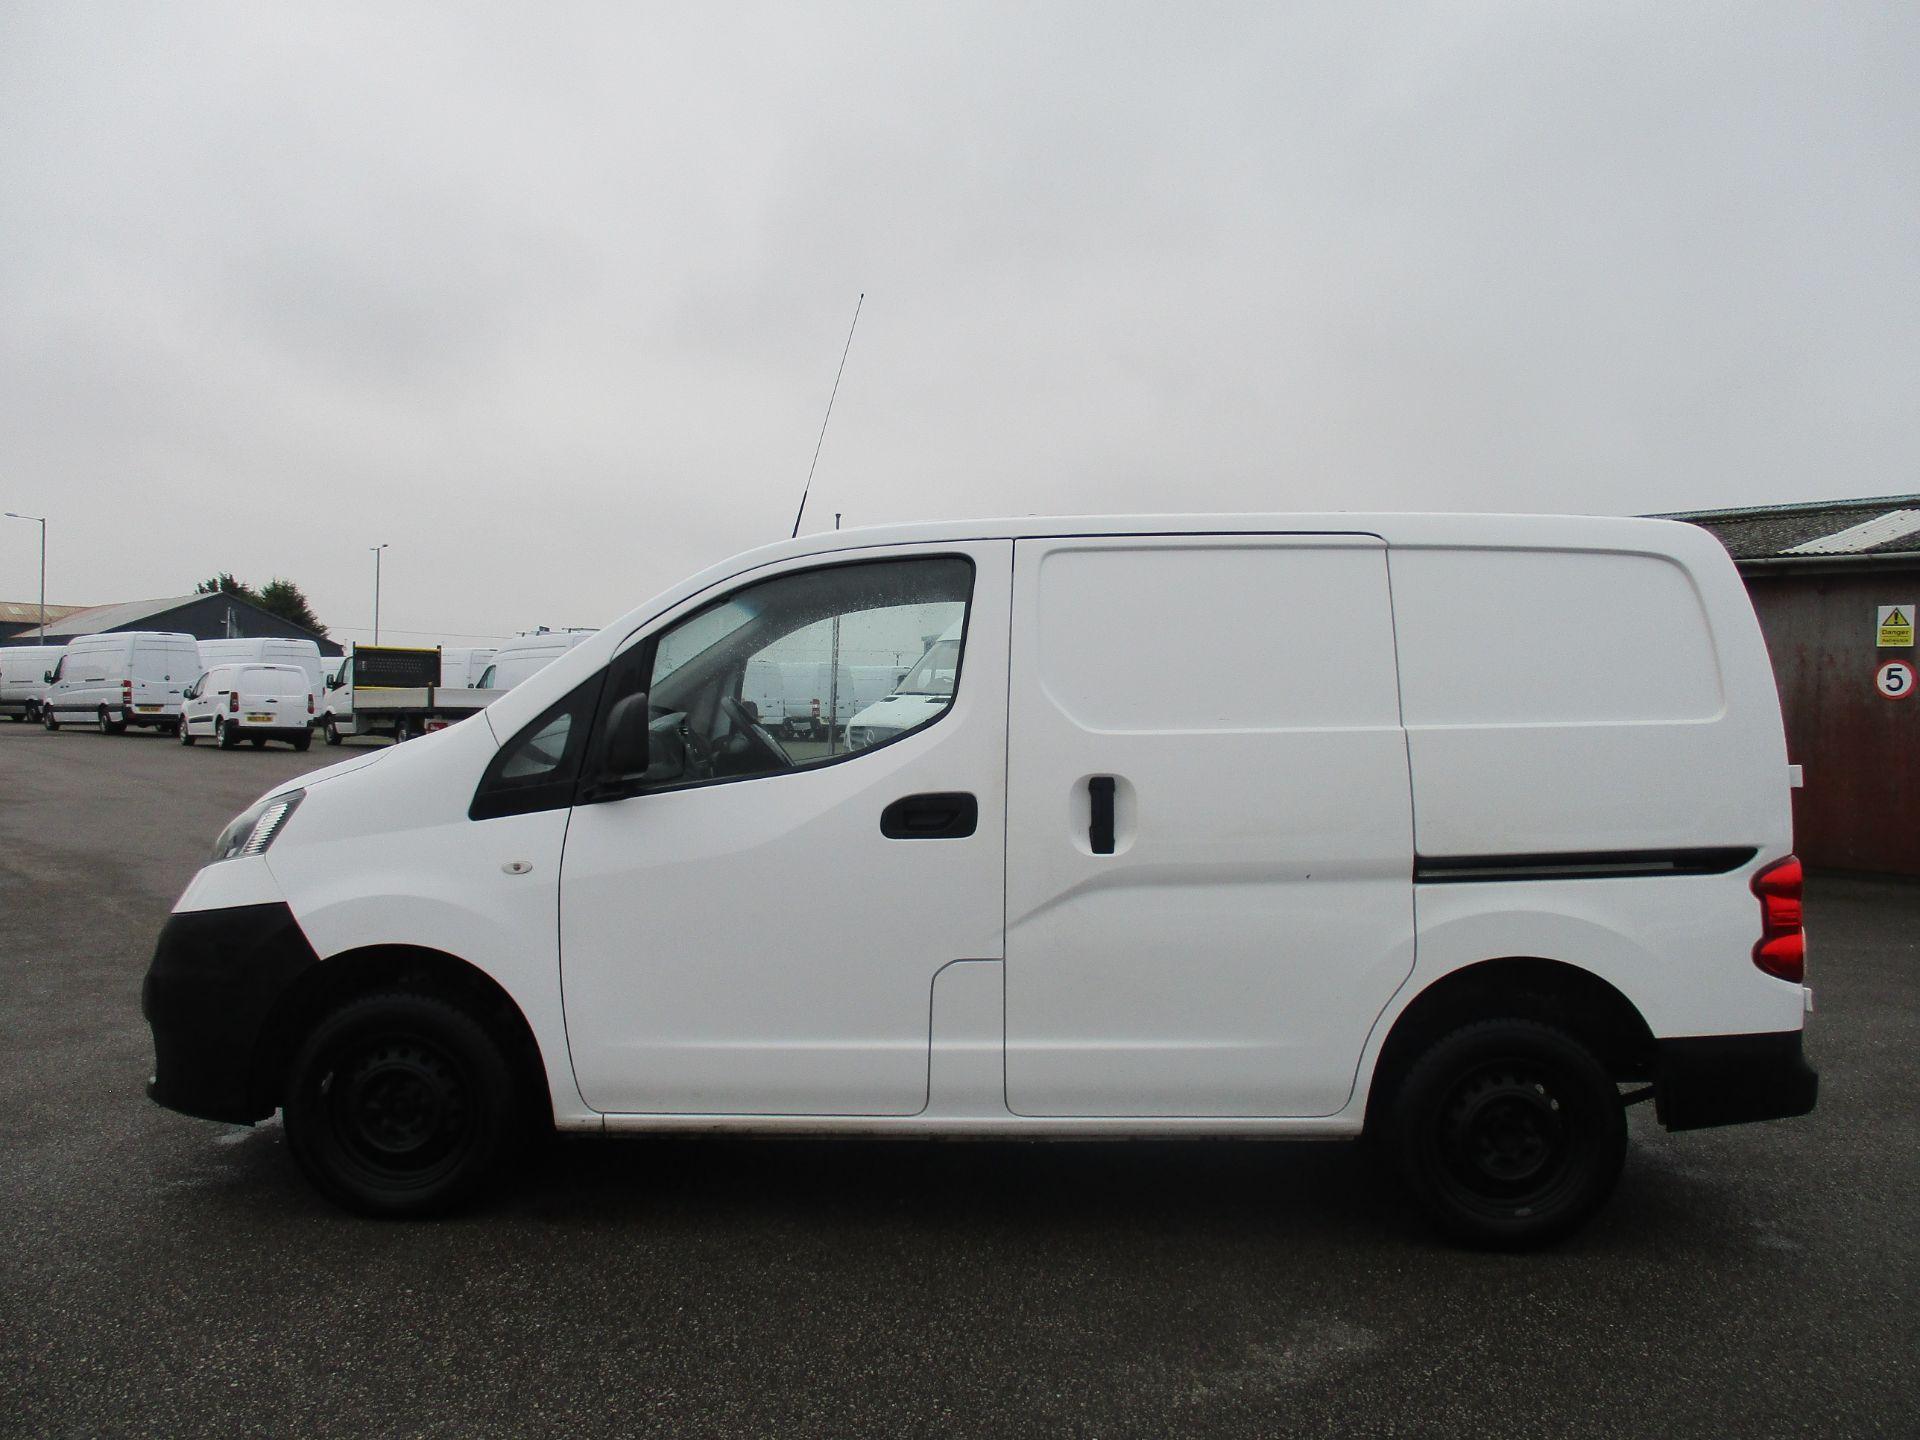 2014 Nissan Nv200 1.5 DCI ACENTA EURO 5 (SJ14YBR) Image 8